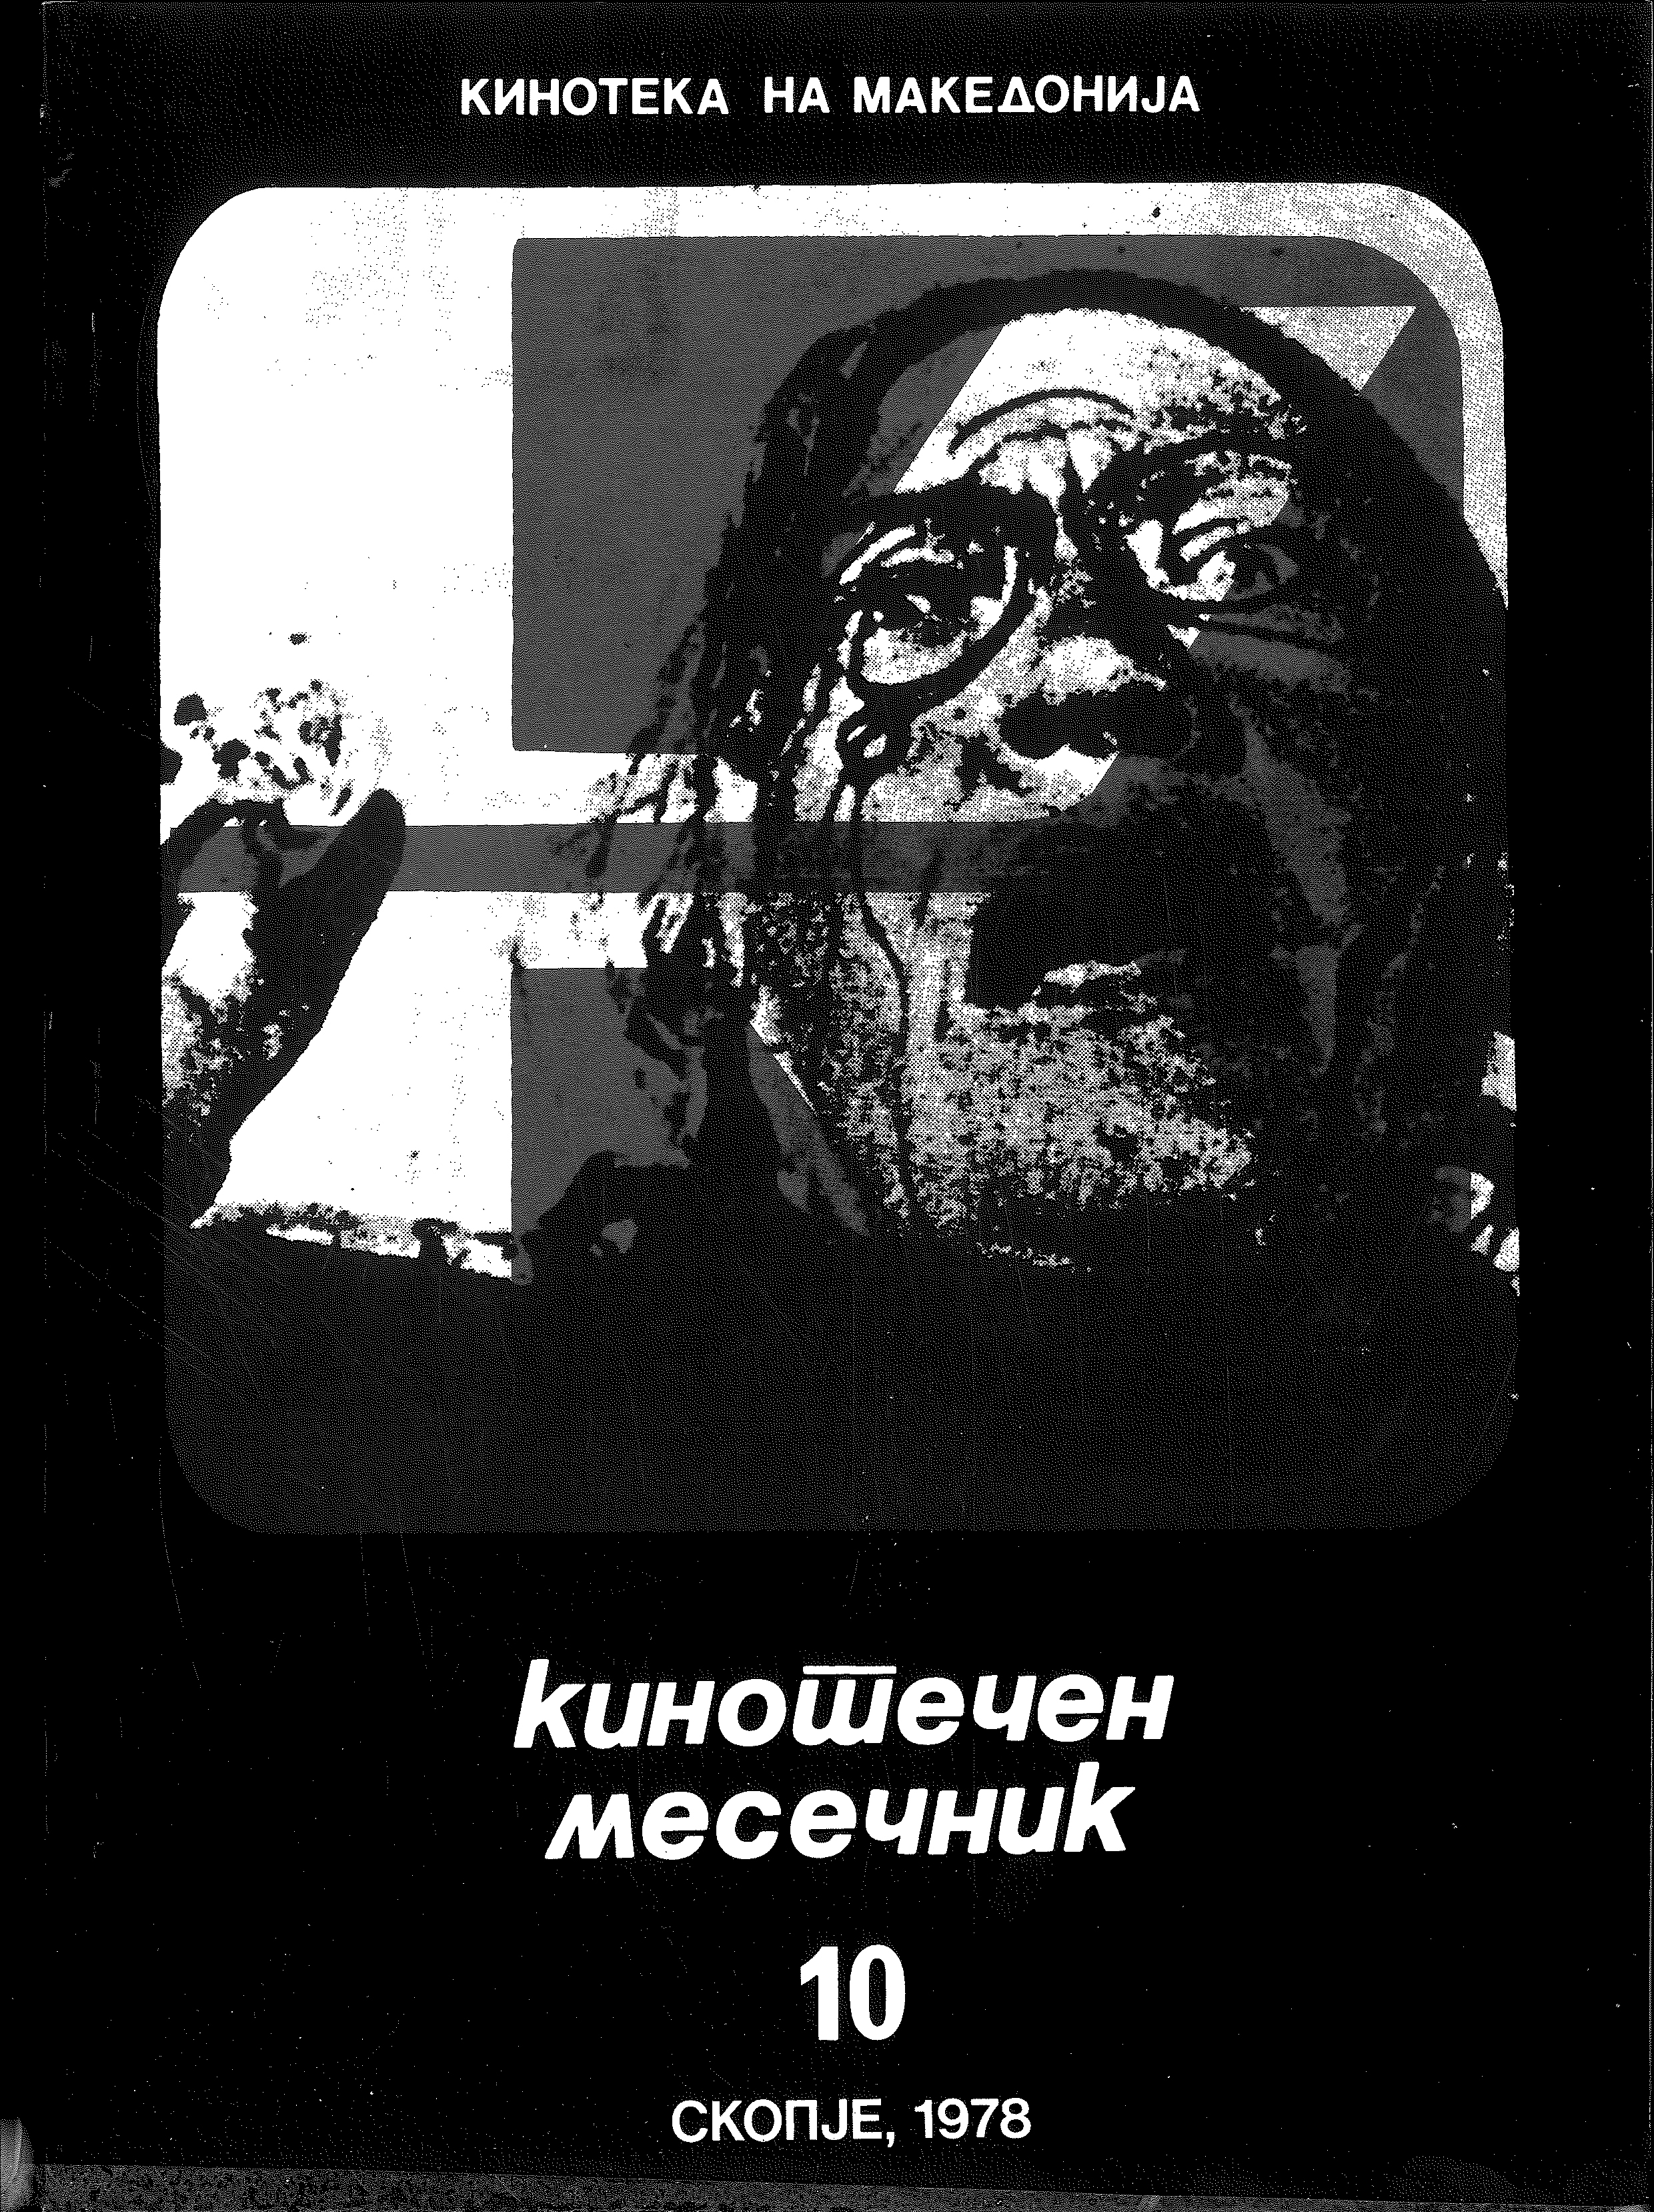 Кинотечен месечник бр. 10